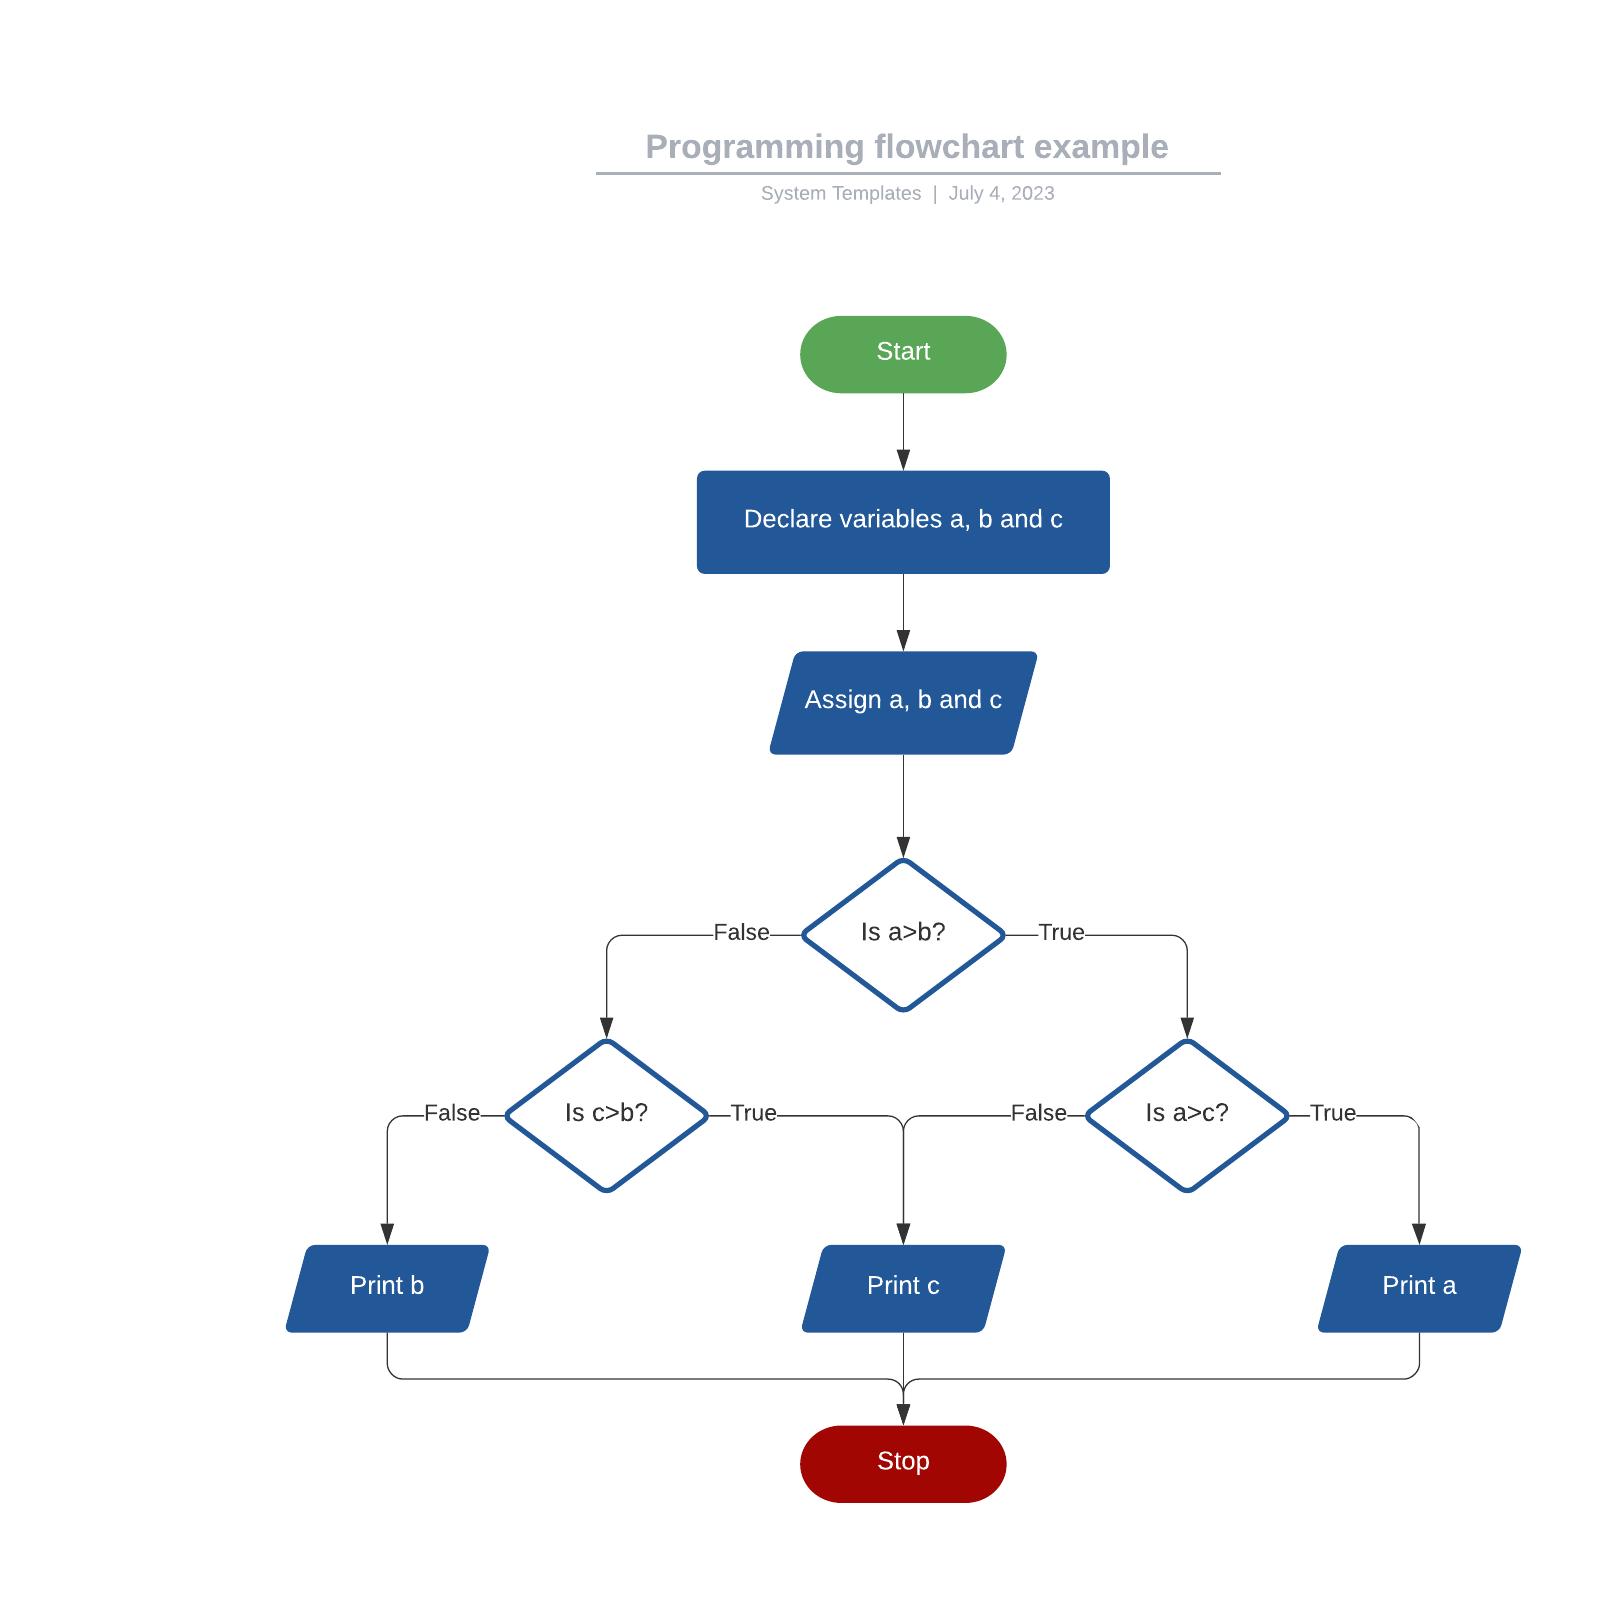 Programming flowchart example